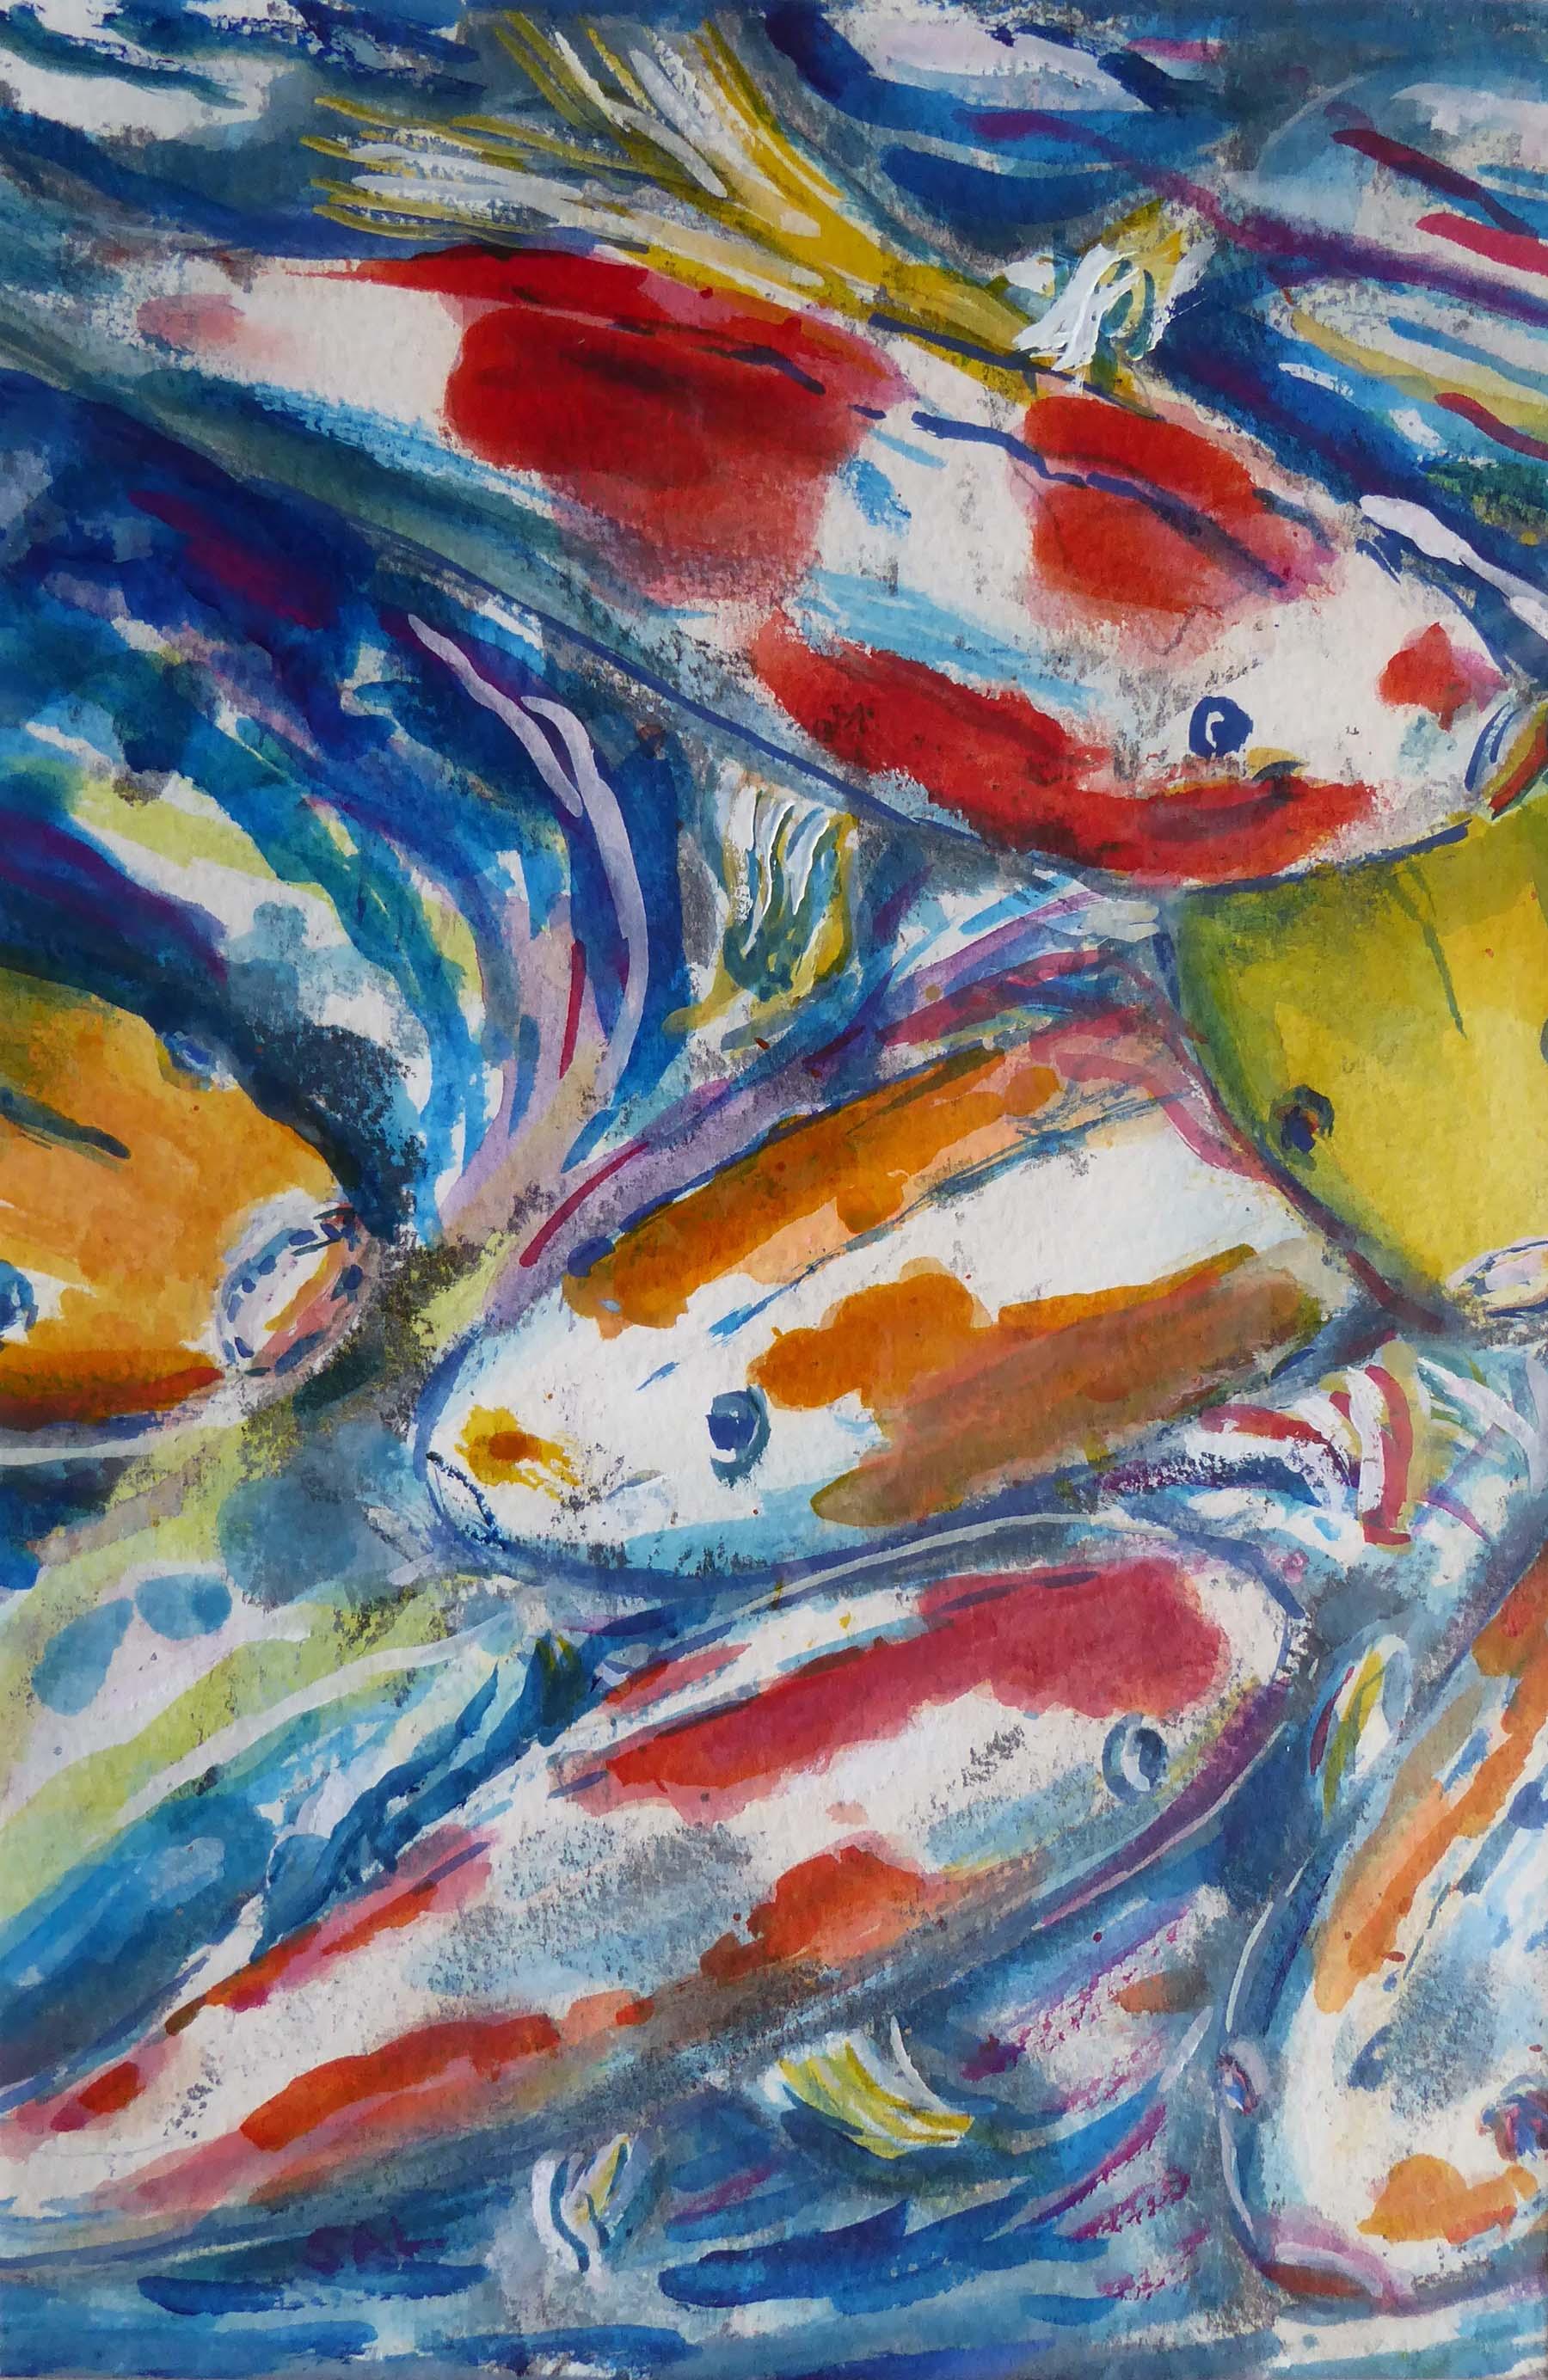 Splash,  Gouache and ink, 30 x 20 cm